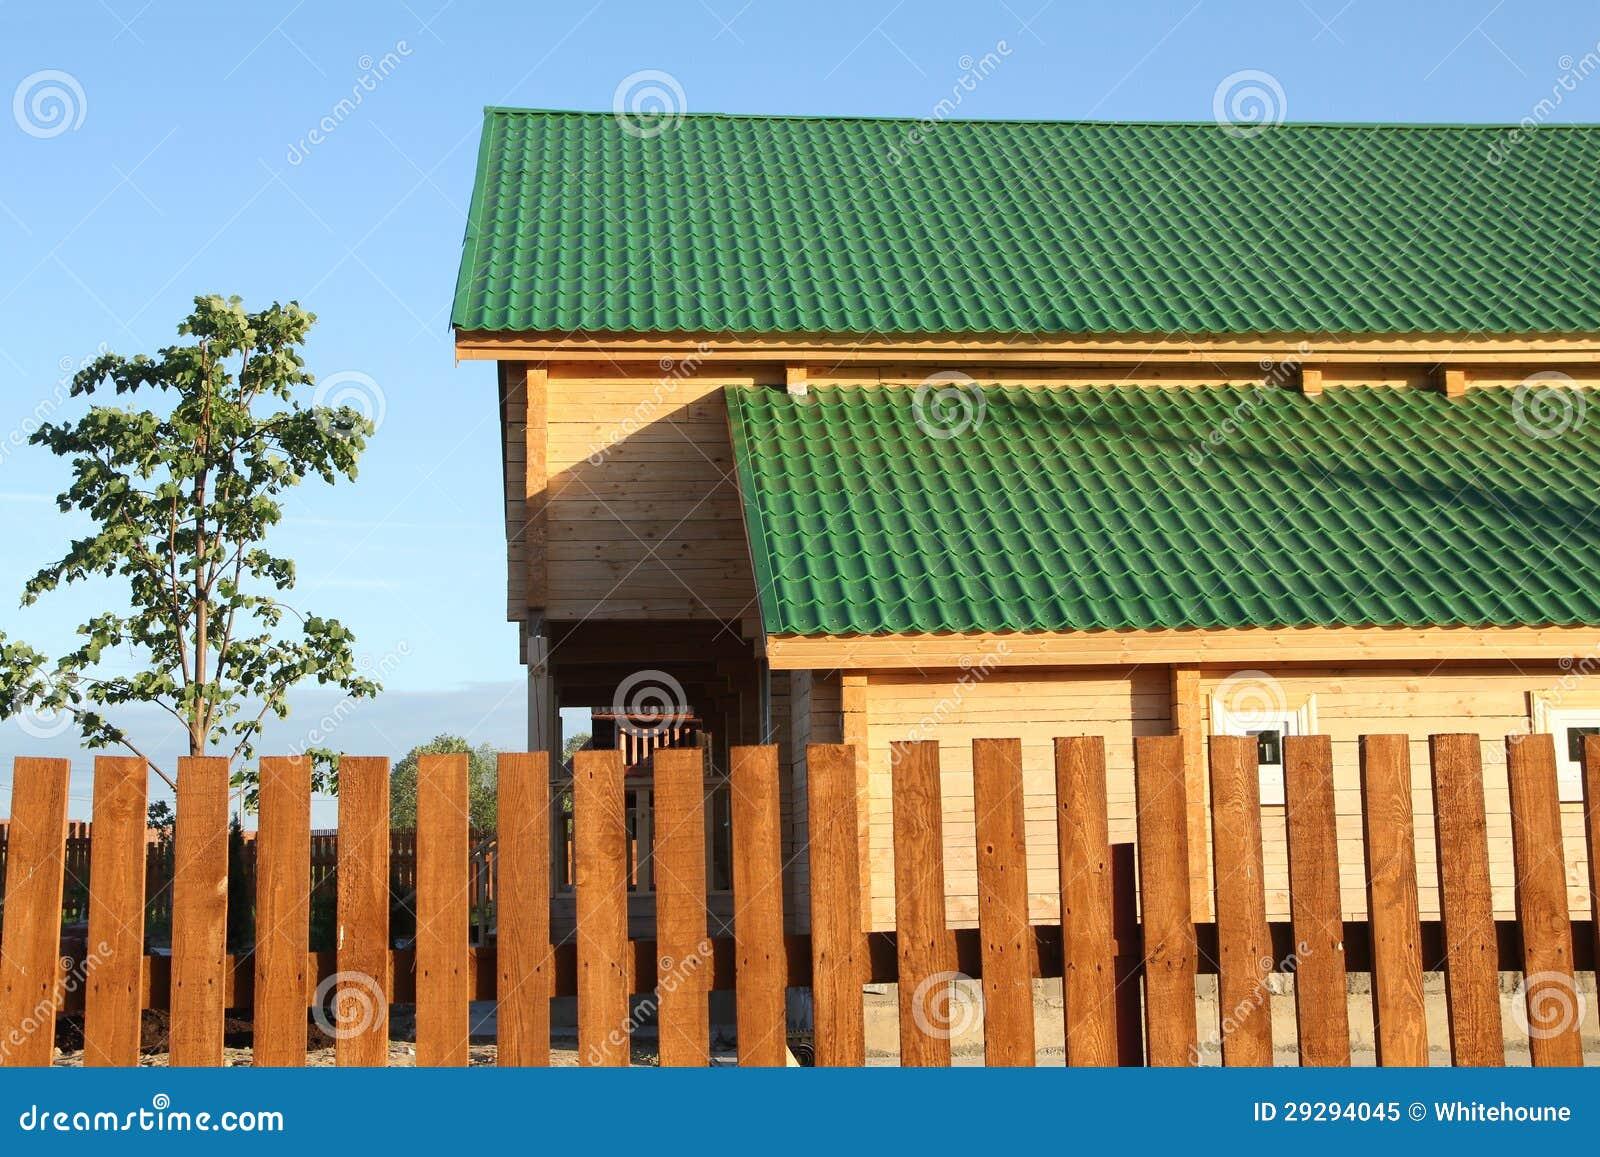 gr nes dach lizenzfreies stockfoto bild 29294045. Black Bedroom Furniture Sets. Home Design Ideas